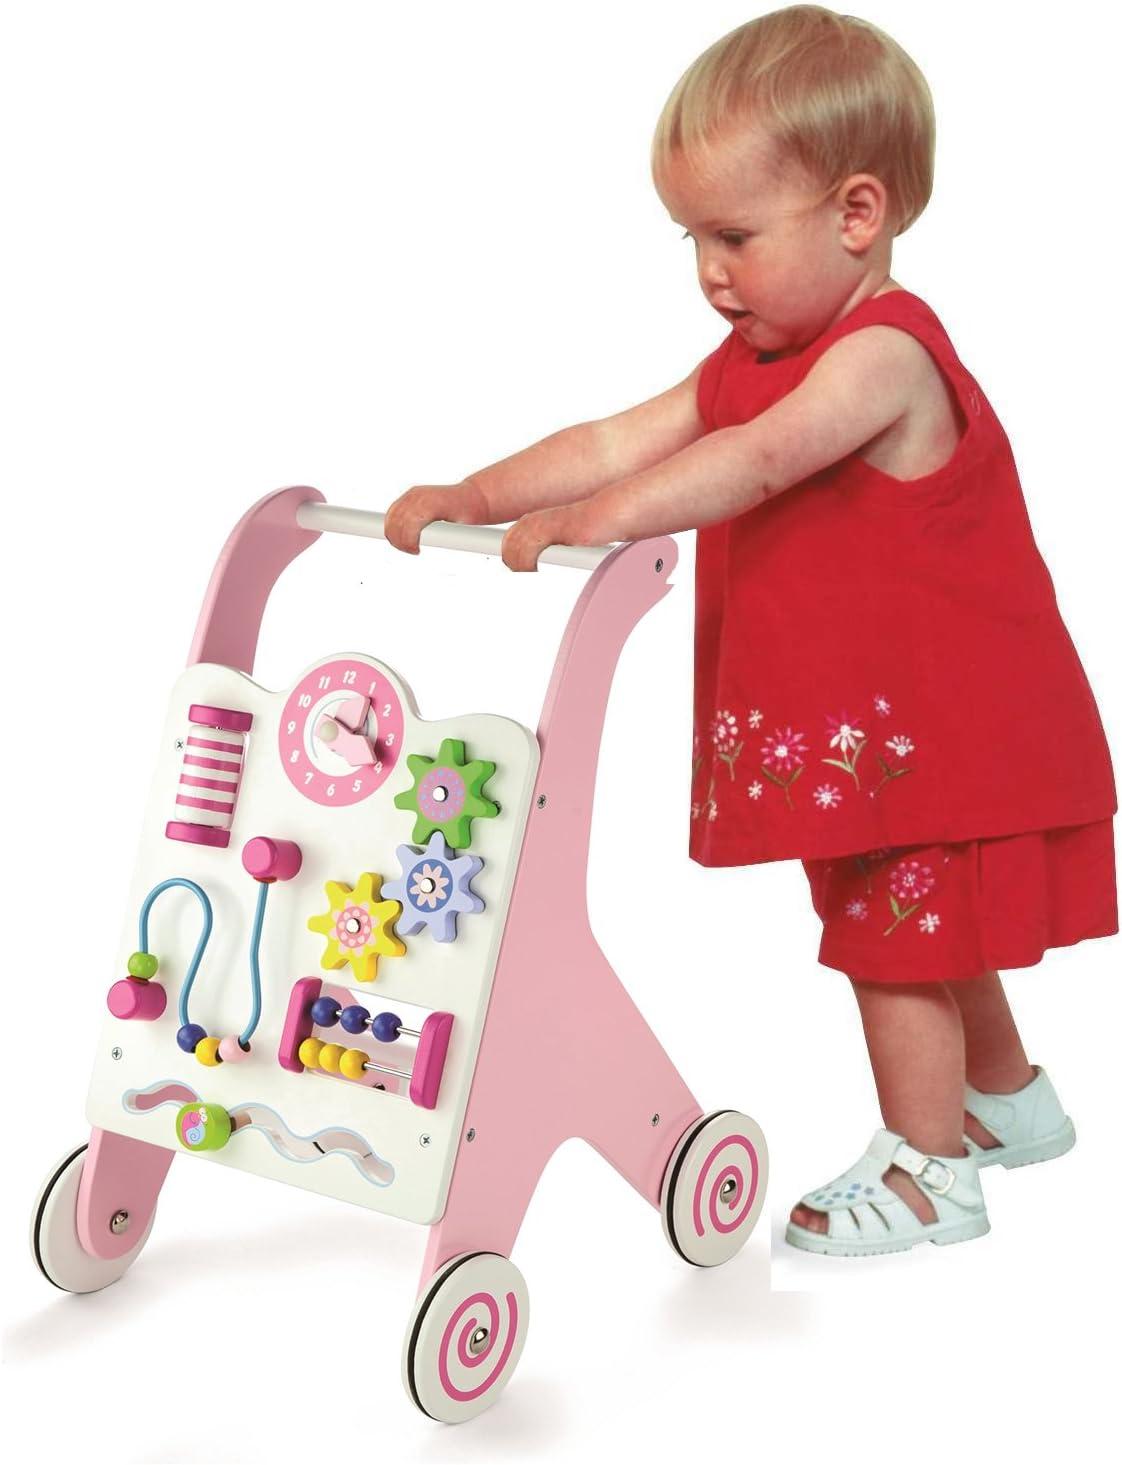 Viga First Steps Baby Walker Activity Centre #50178